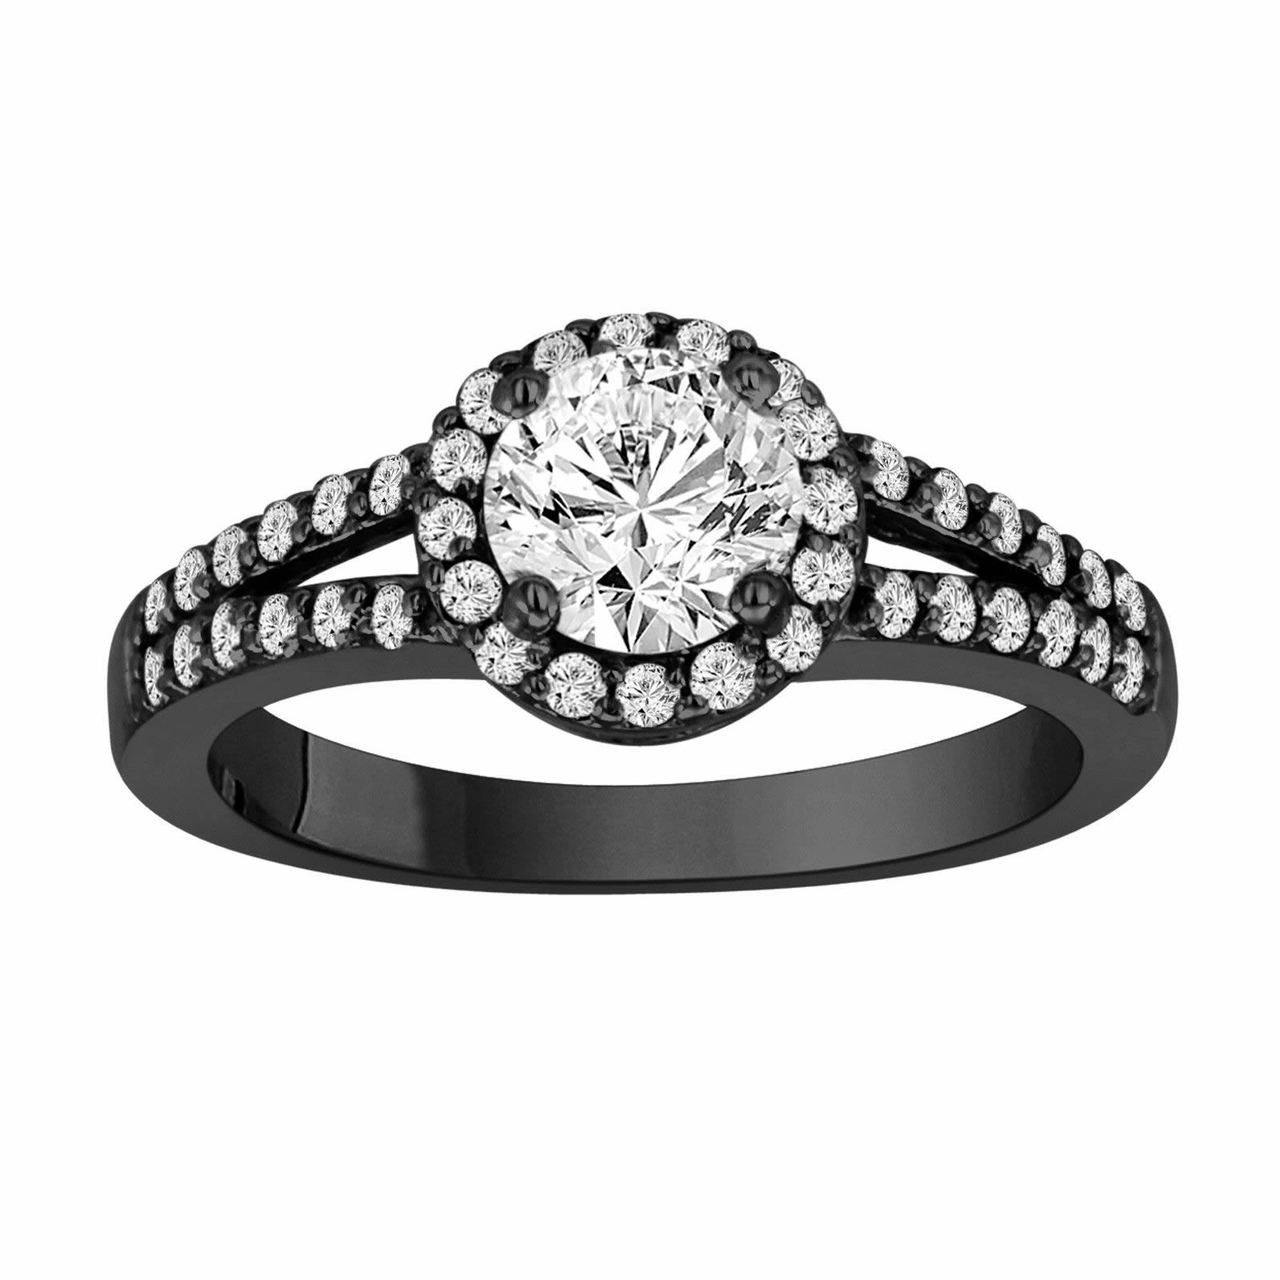 Antique Style 4 2mm Platinum Men S Wedding Band With: 14k Black Gold Diamond Engagement Ring 1.34 Carat Vintage